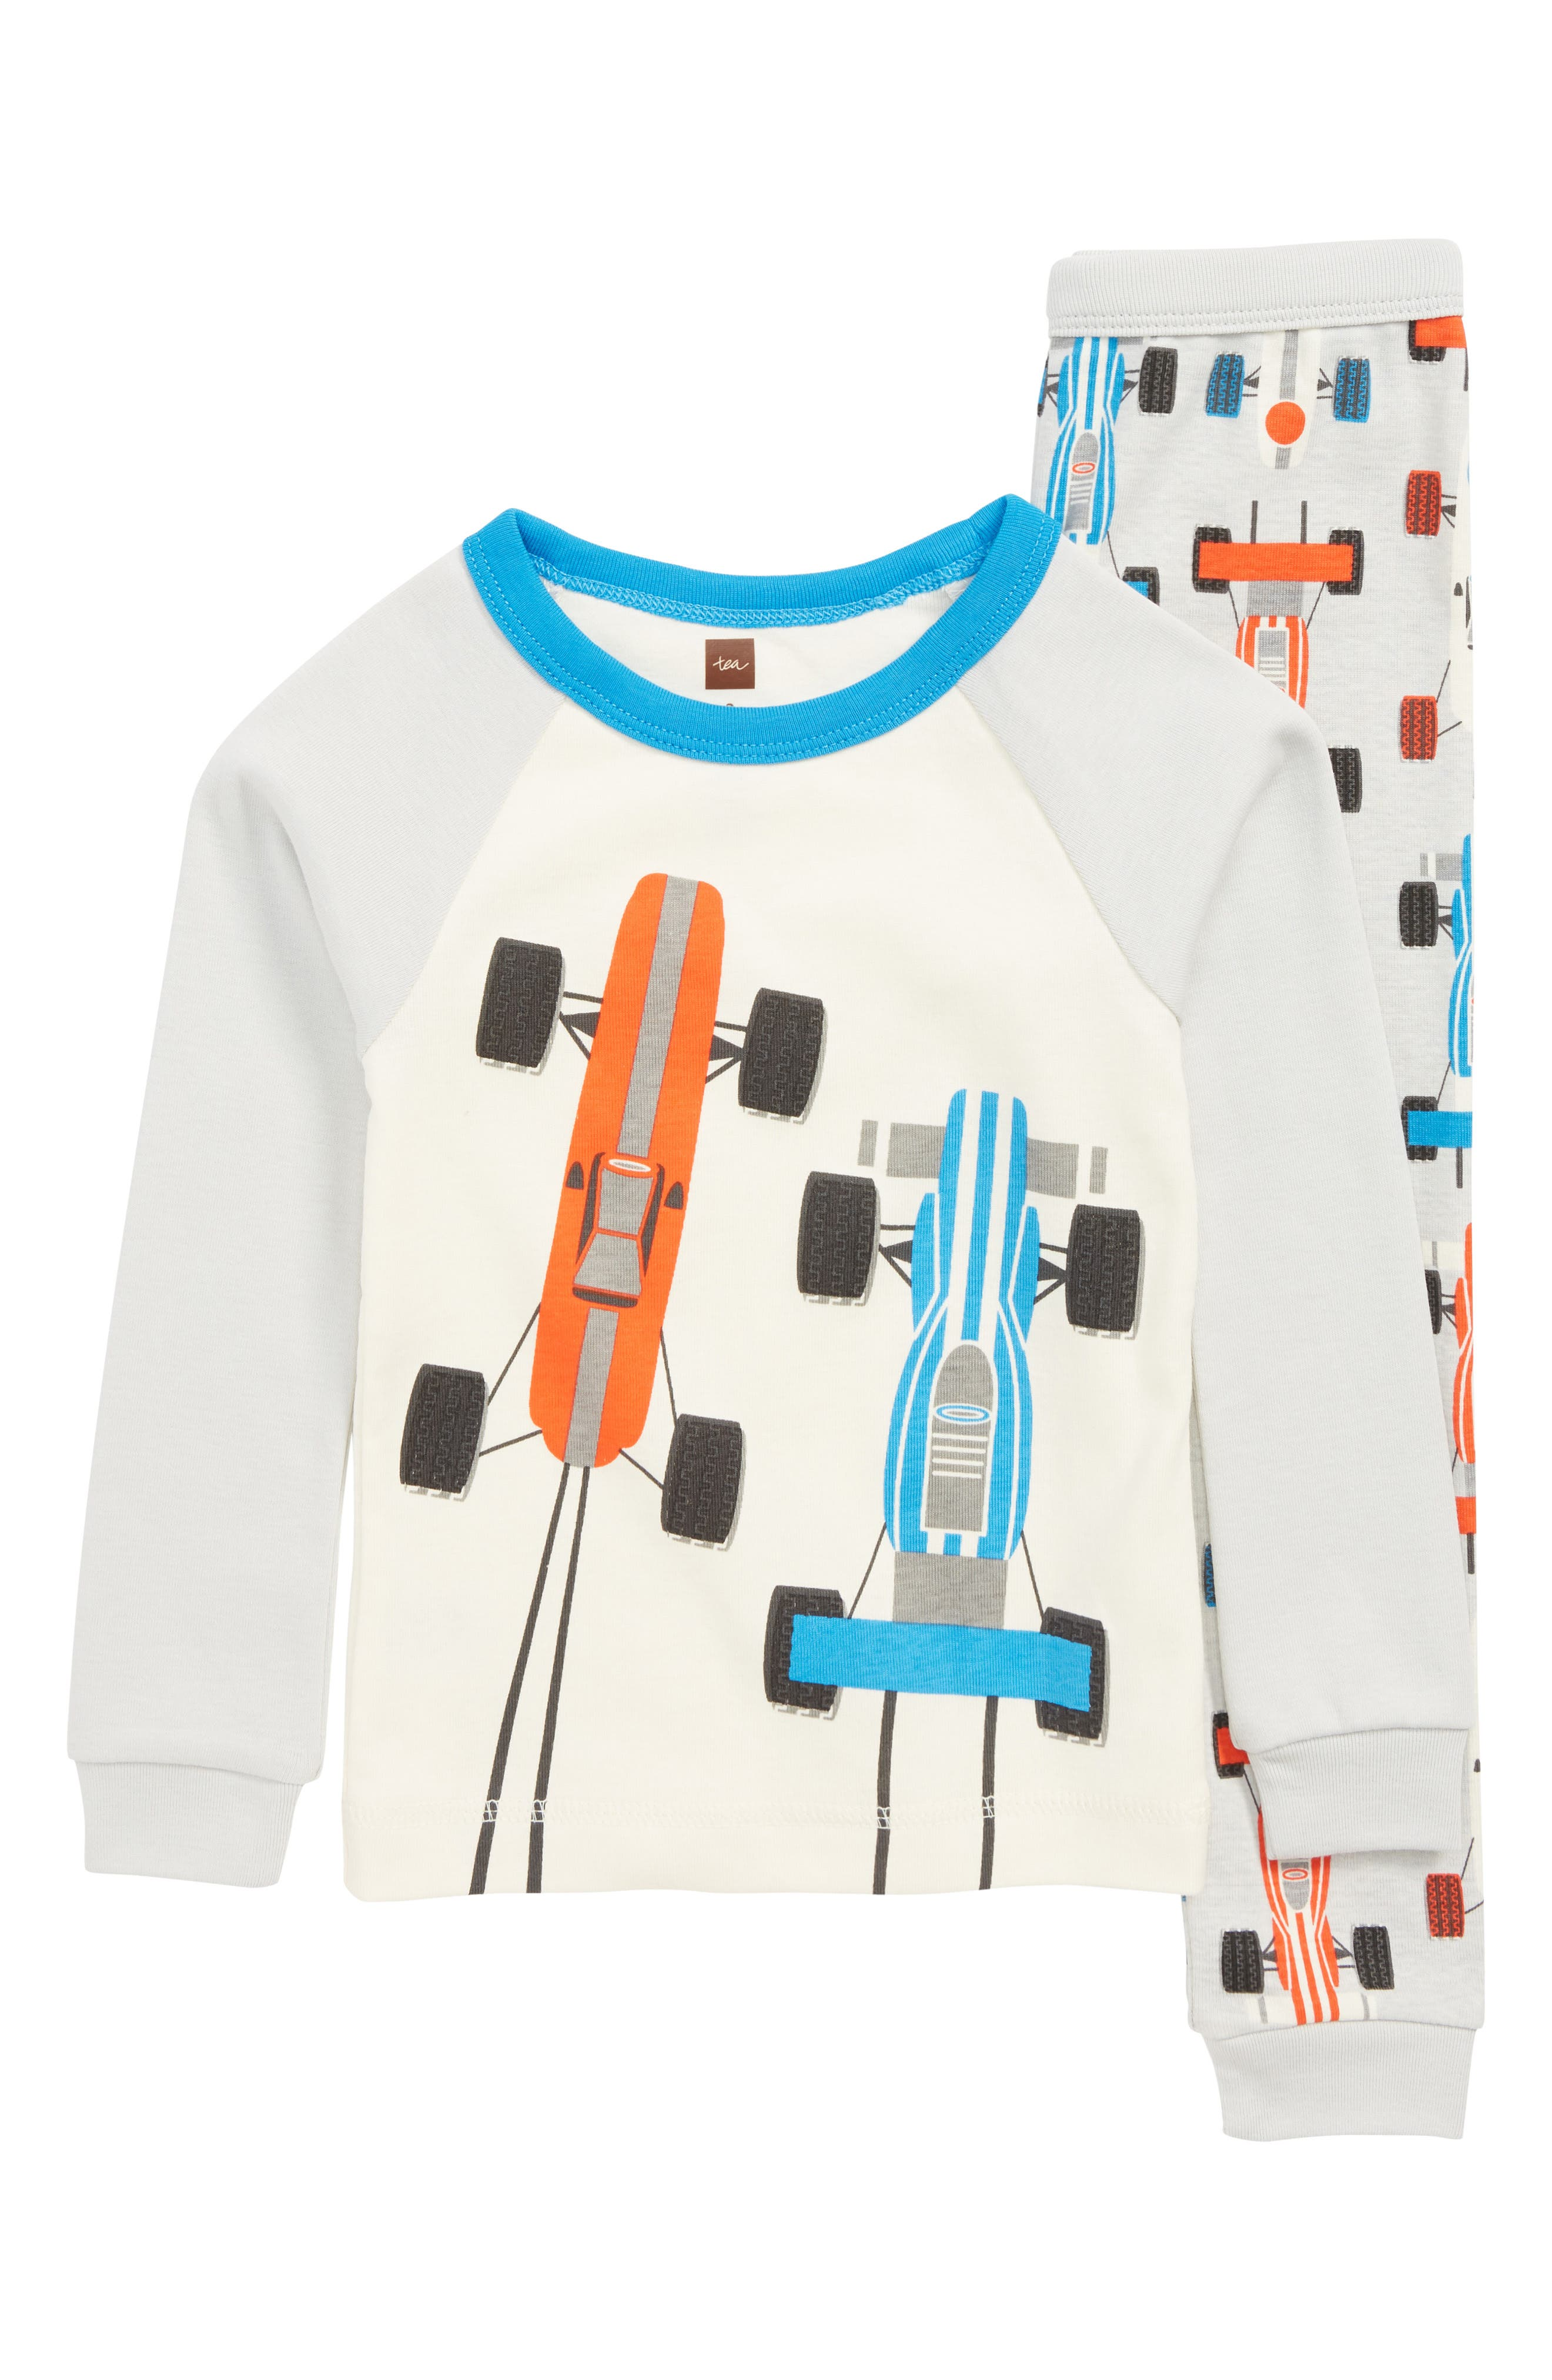 Racecar Print Fitted Two-Piece Pajamas,                             Main thumbnail 1, color,                             RACE CAR SCRAMBLE